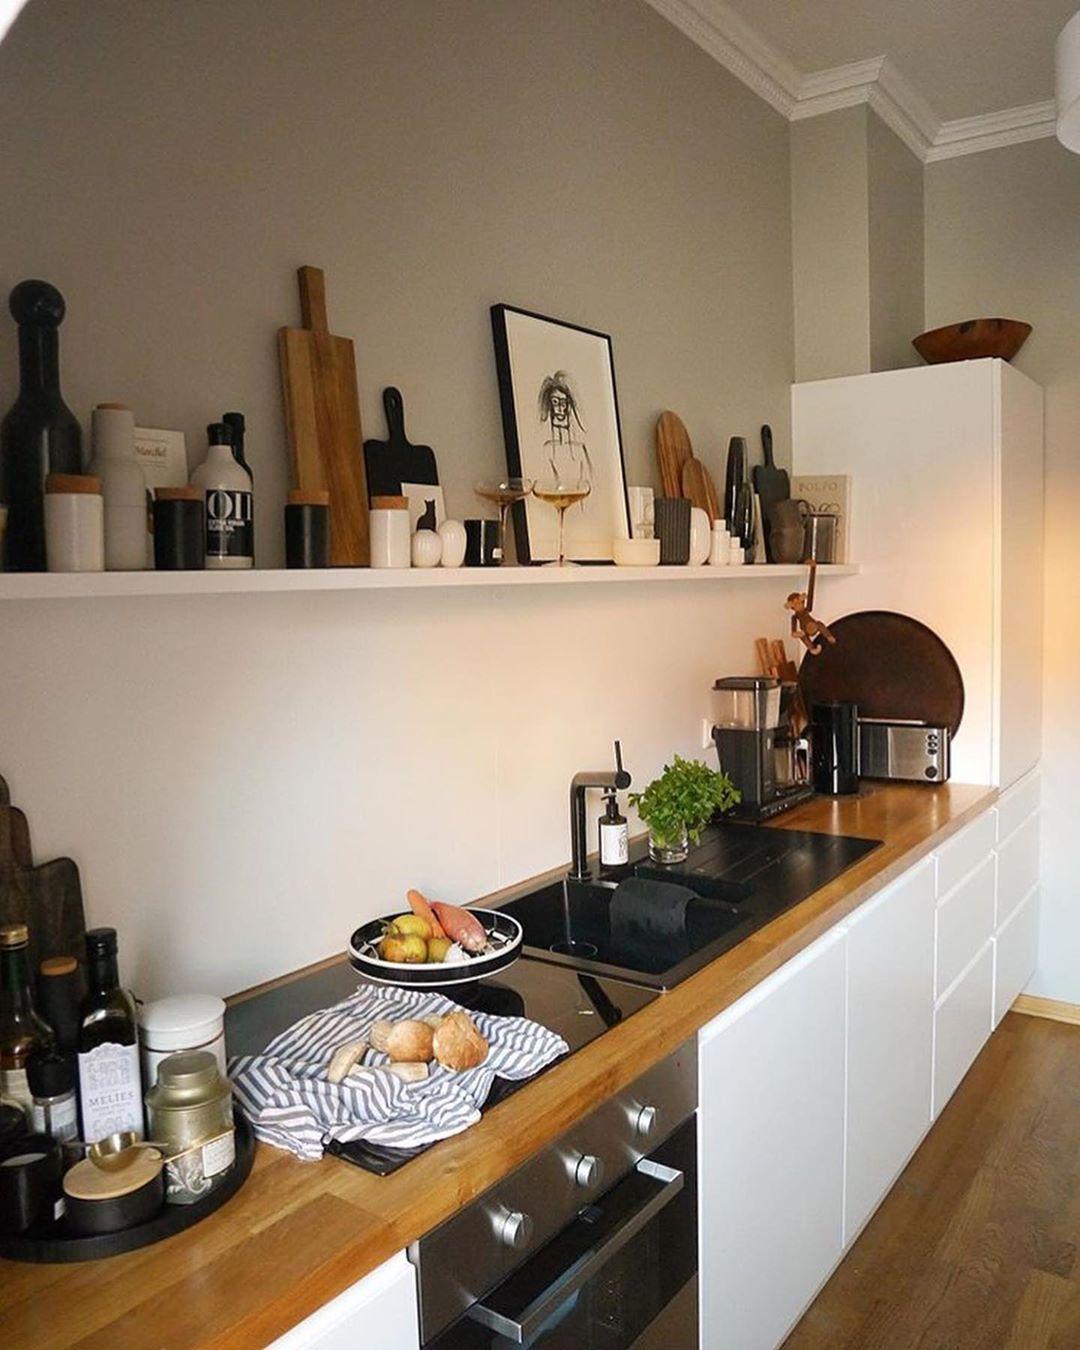 Kitchen goals ...   Kitchen design small, Kitchen design, Home ...